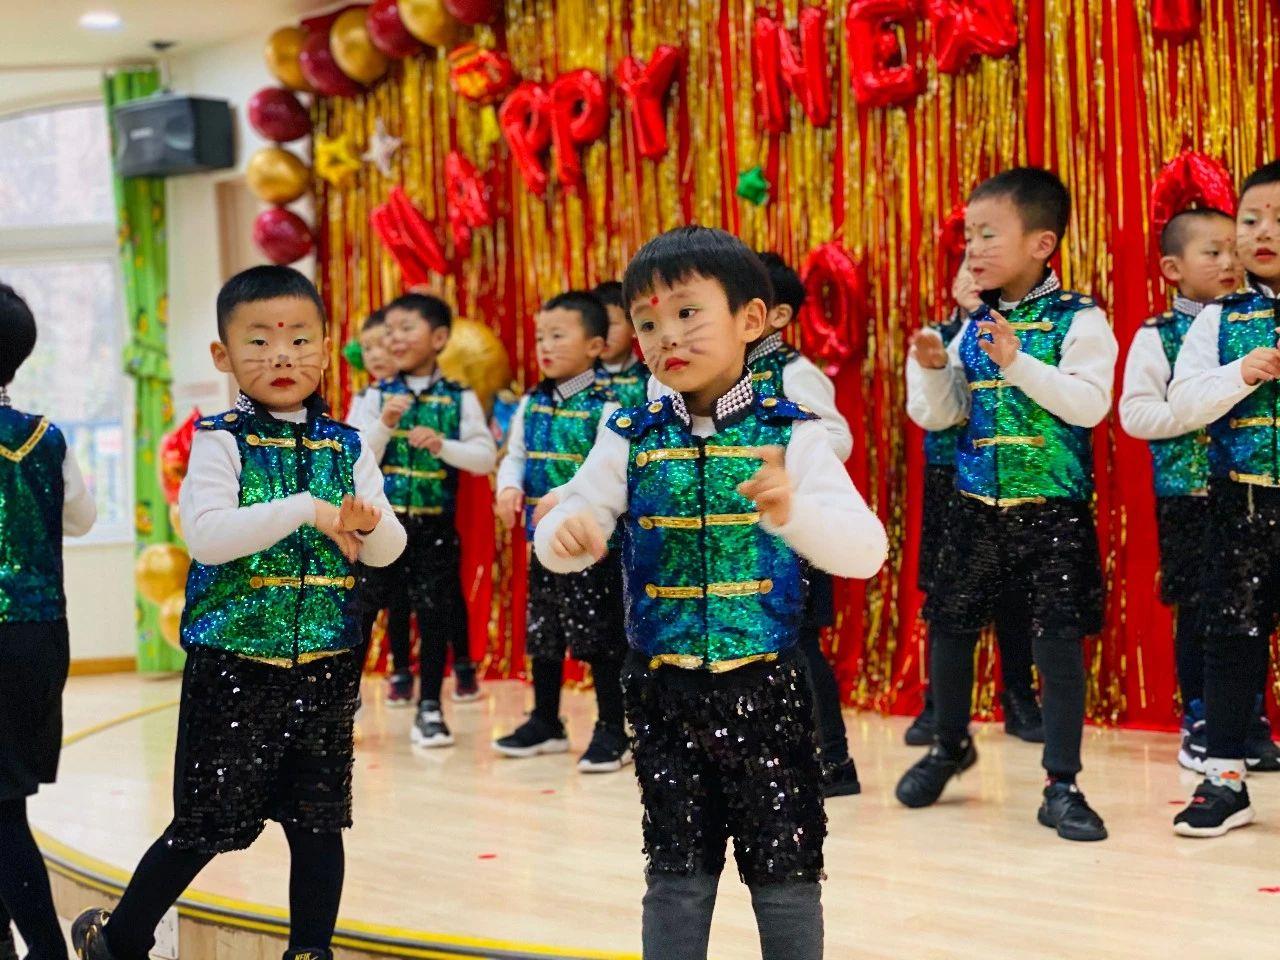 "【KID-CASTLE】吉的堡西北区直营幼儿园------""浓浓民俗情、甜甜新年味"""